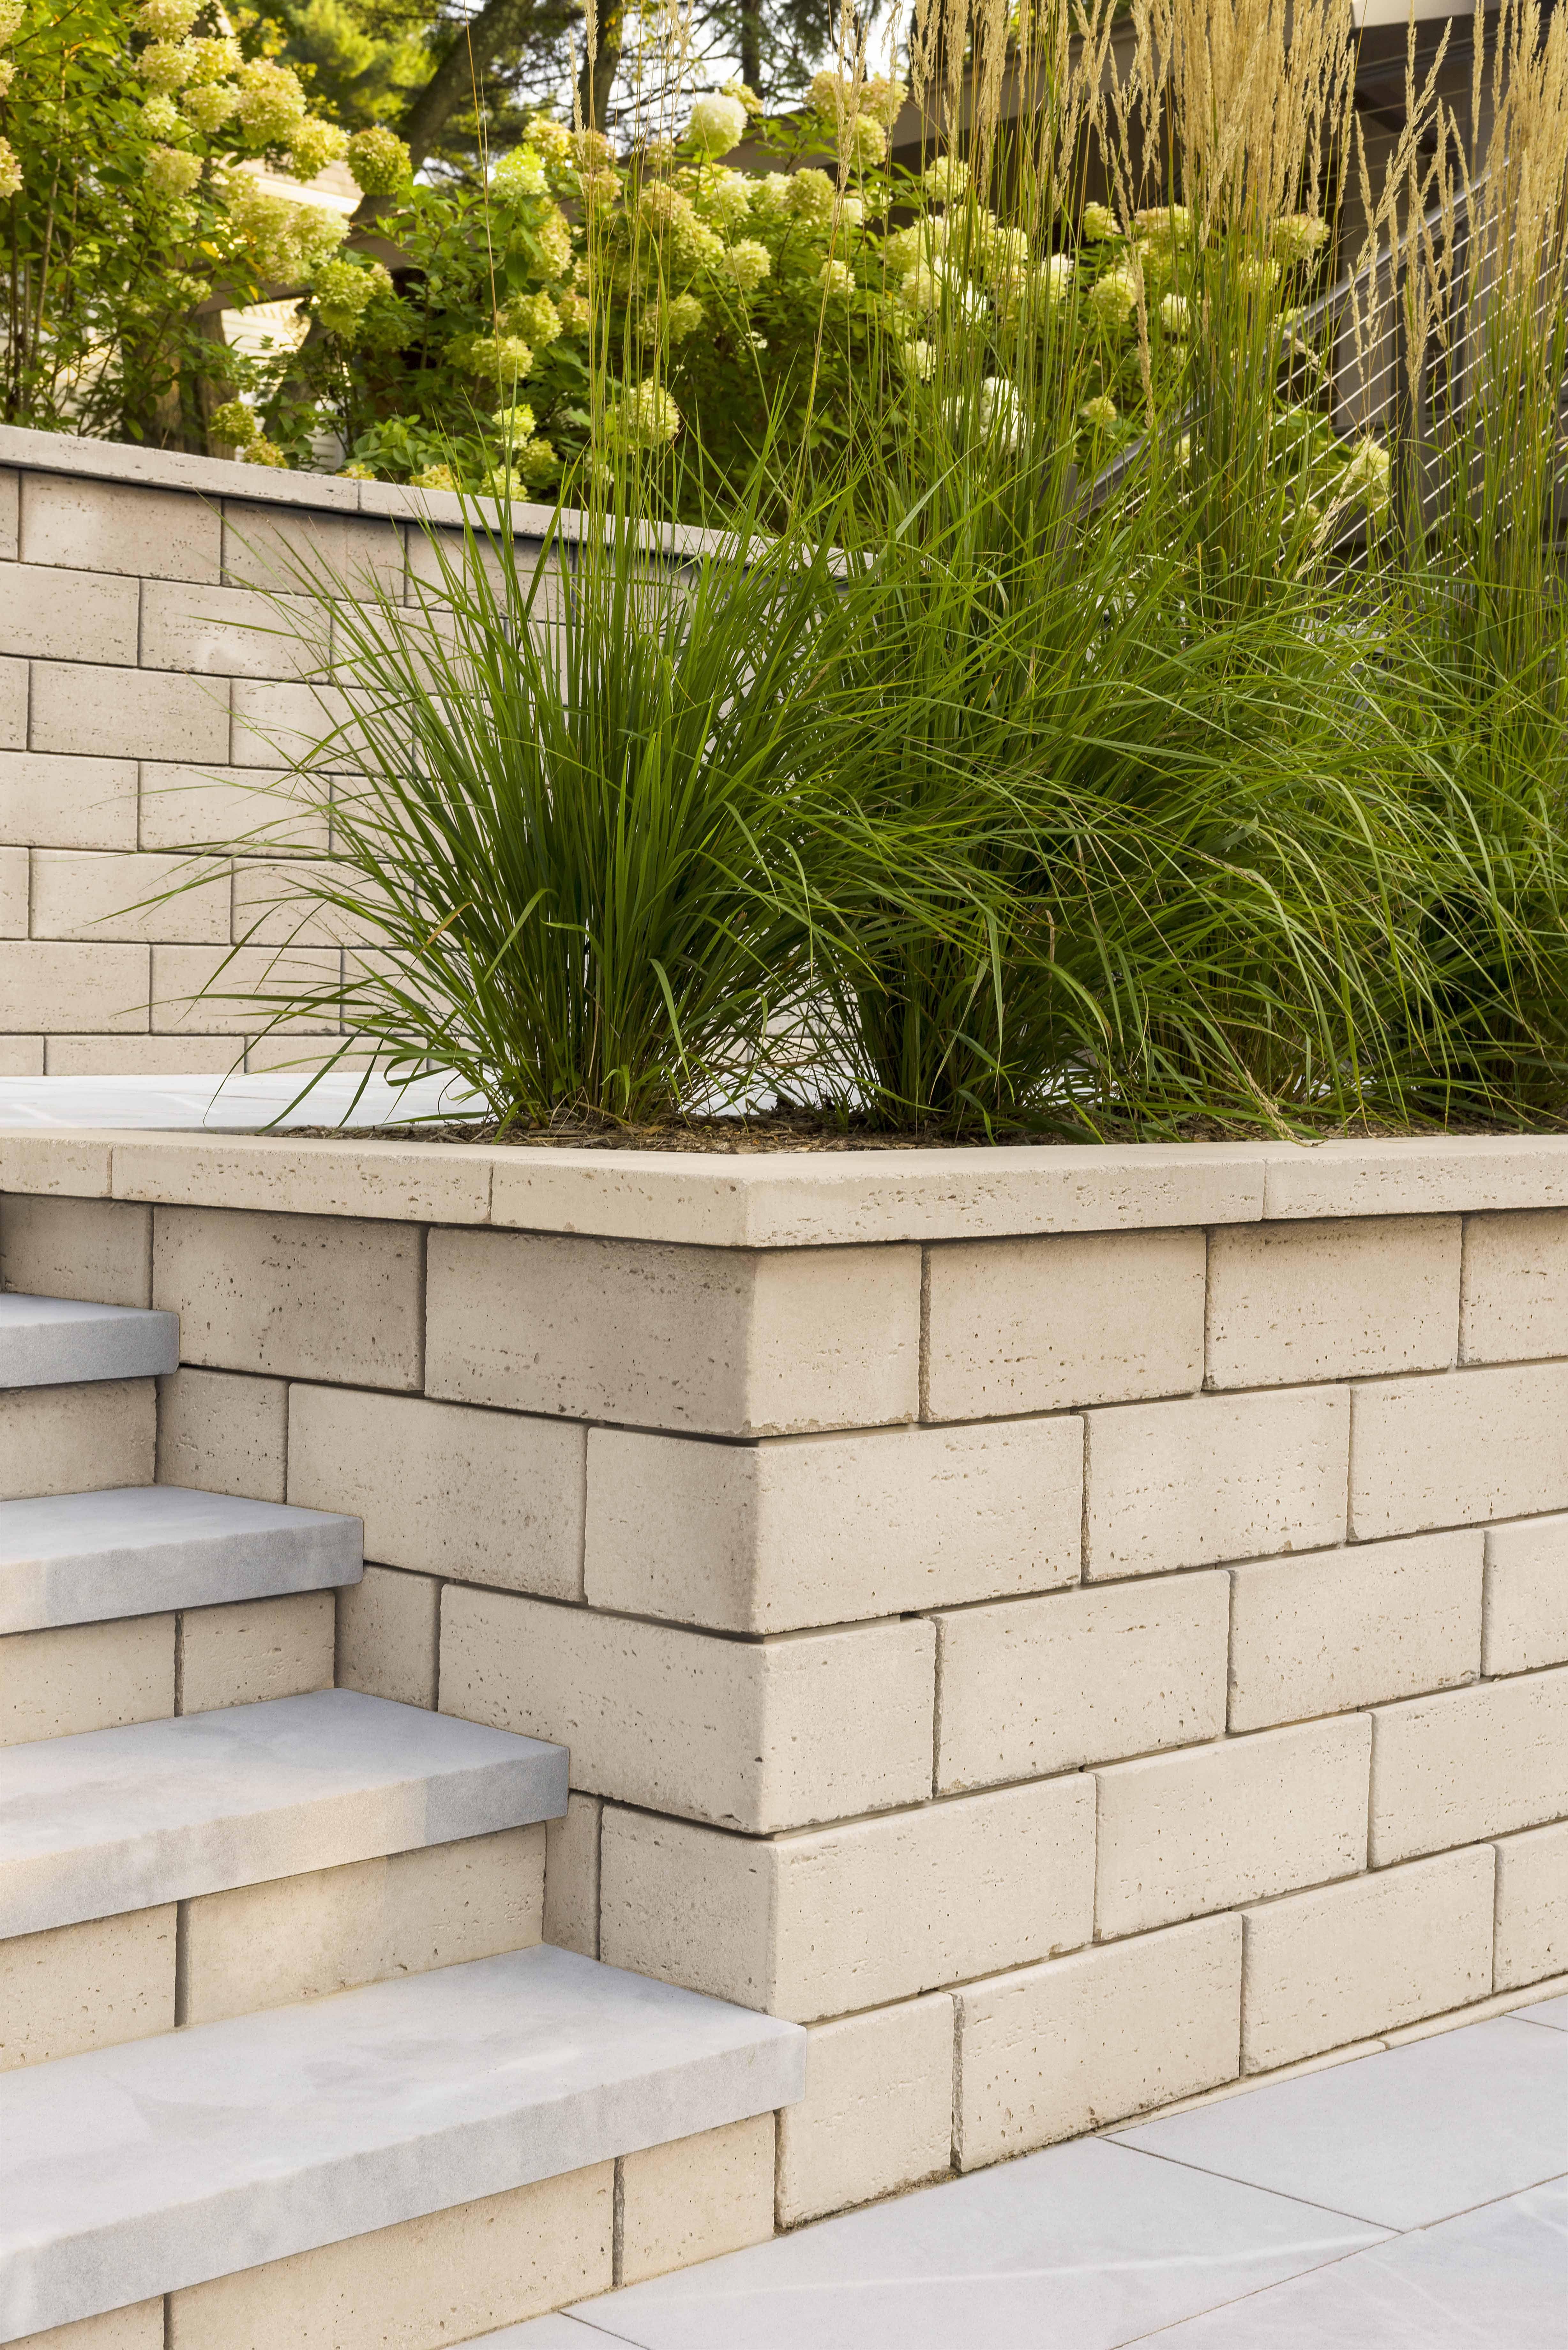 Retaining Wall Ideas In 2020 Retaining Wall Design Backyard Landscaping Retaining Wall